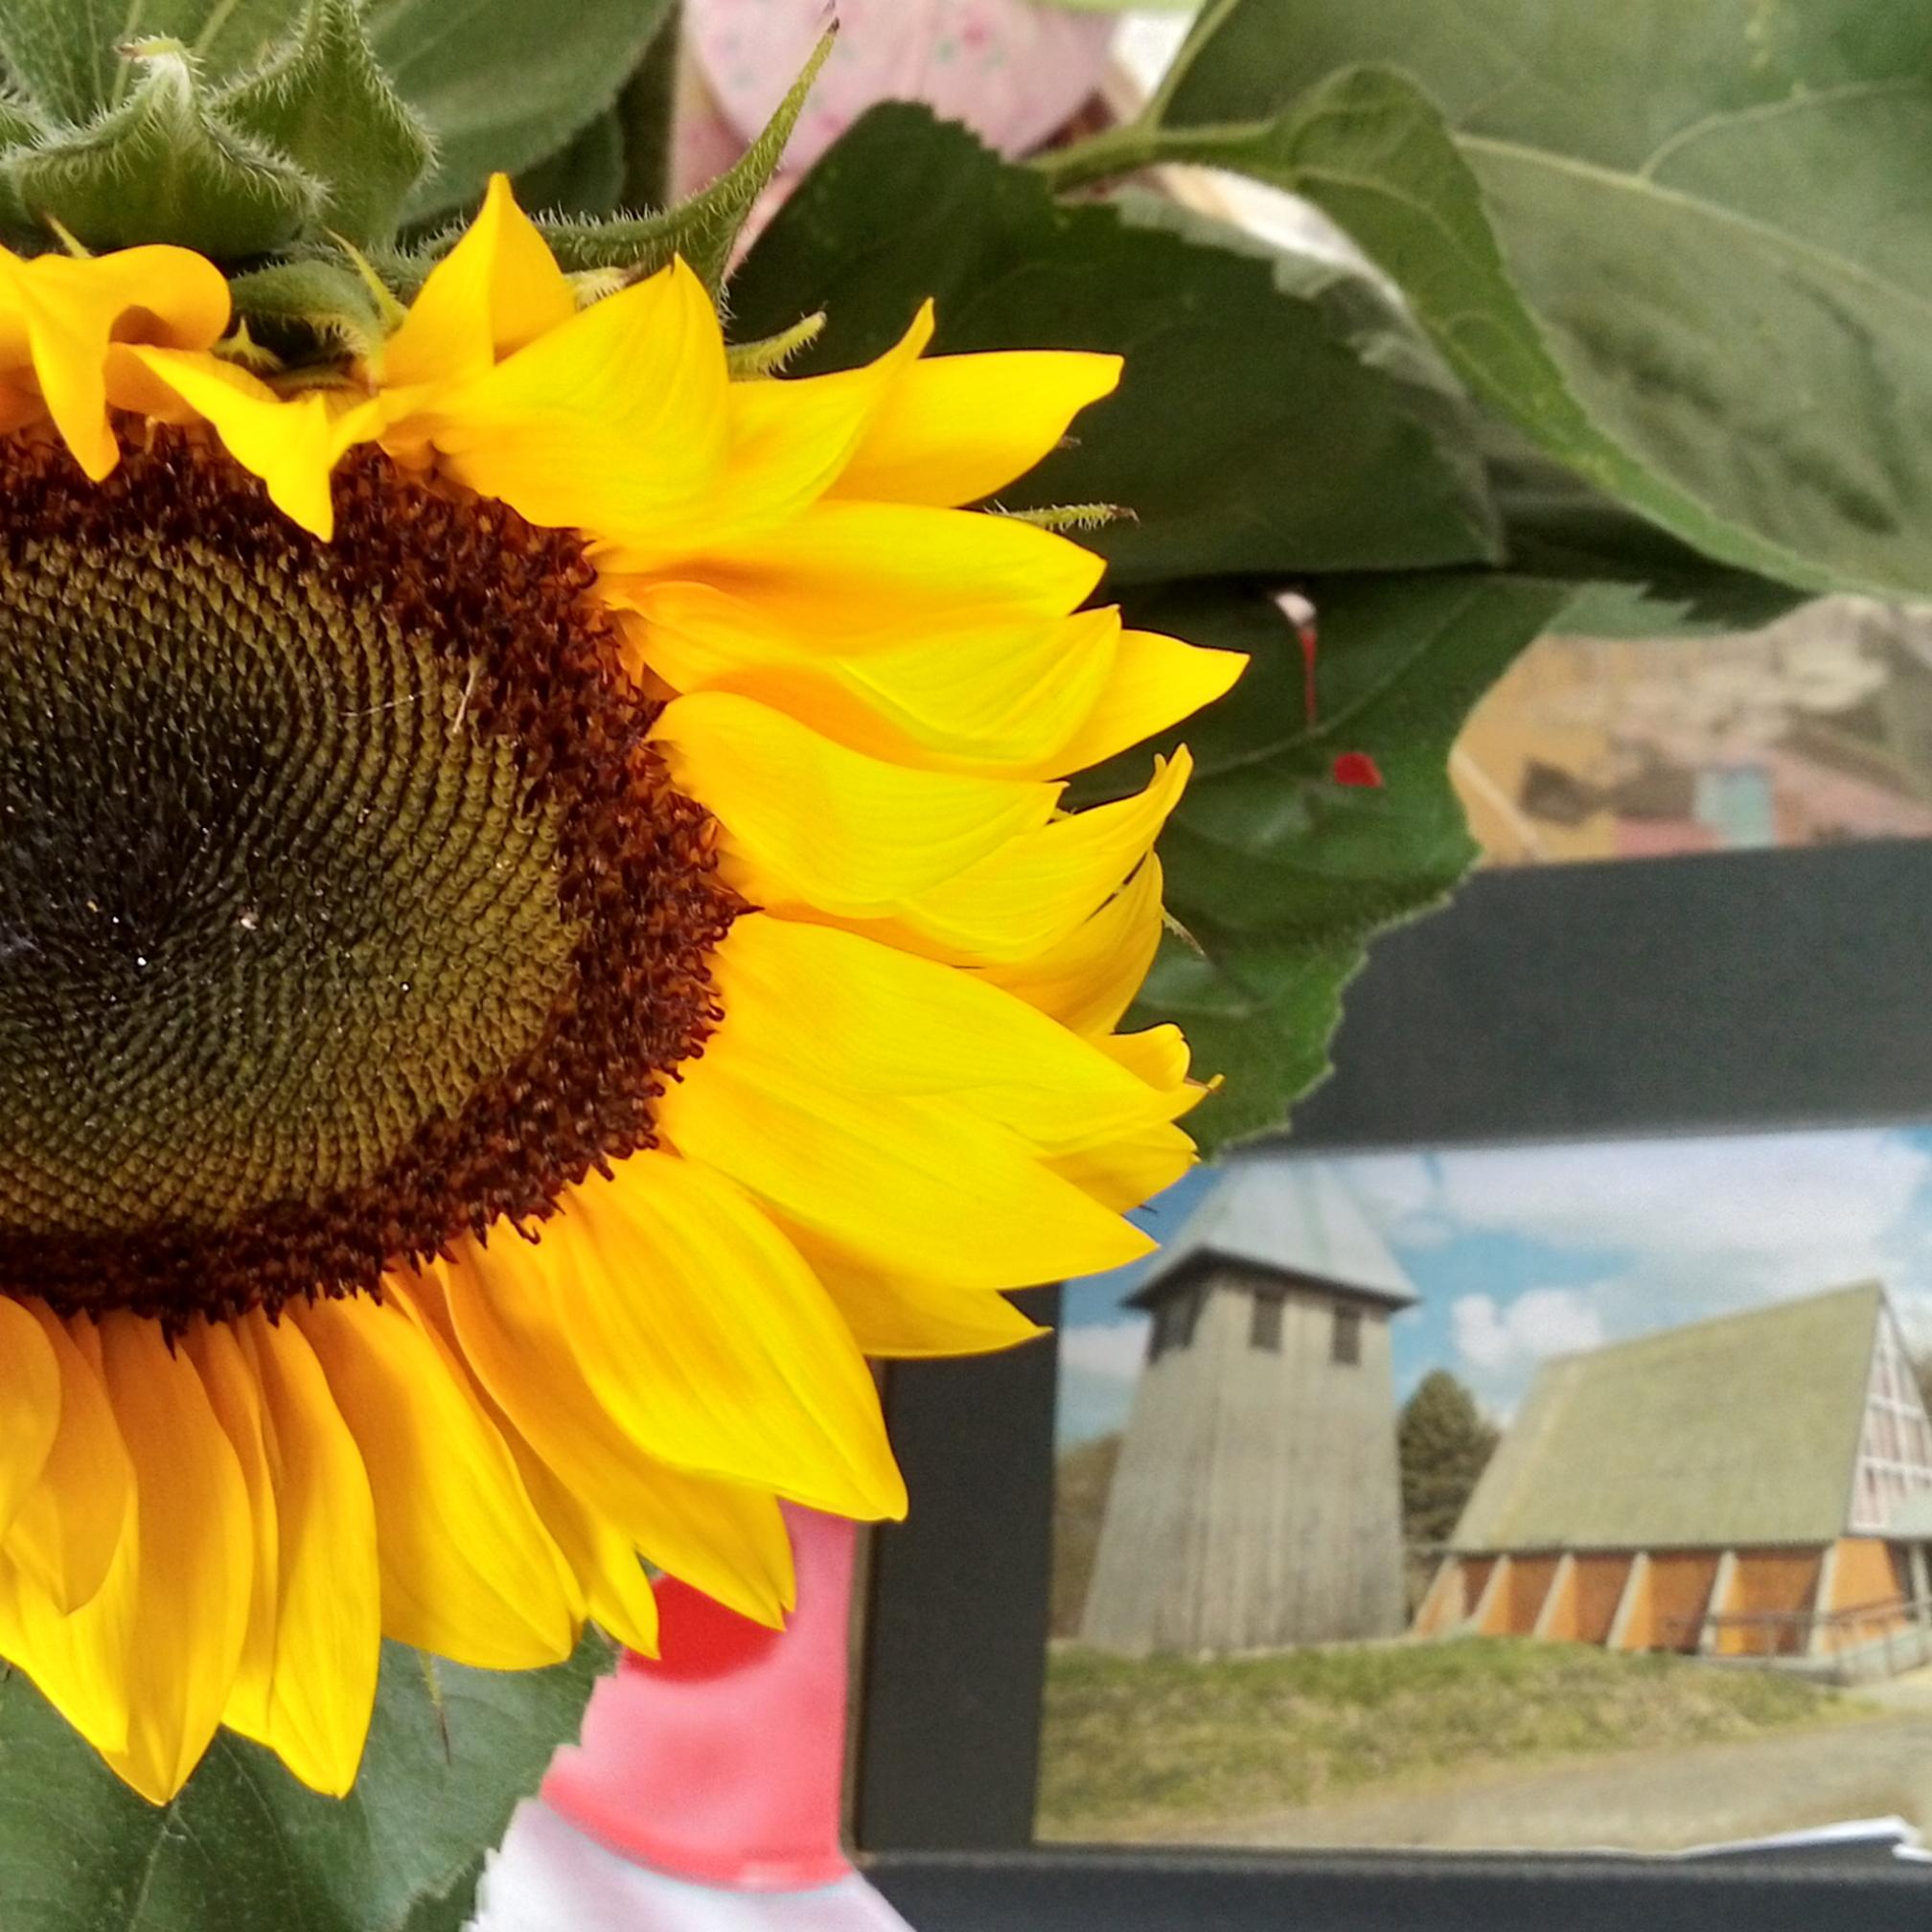 Vereinstag_Sonnenblume_Kirche_25.08.19